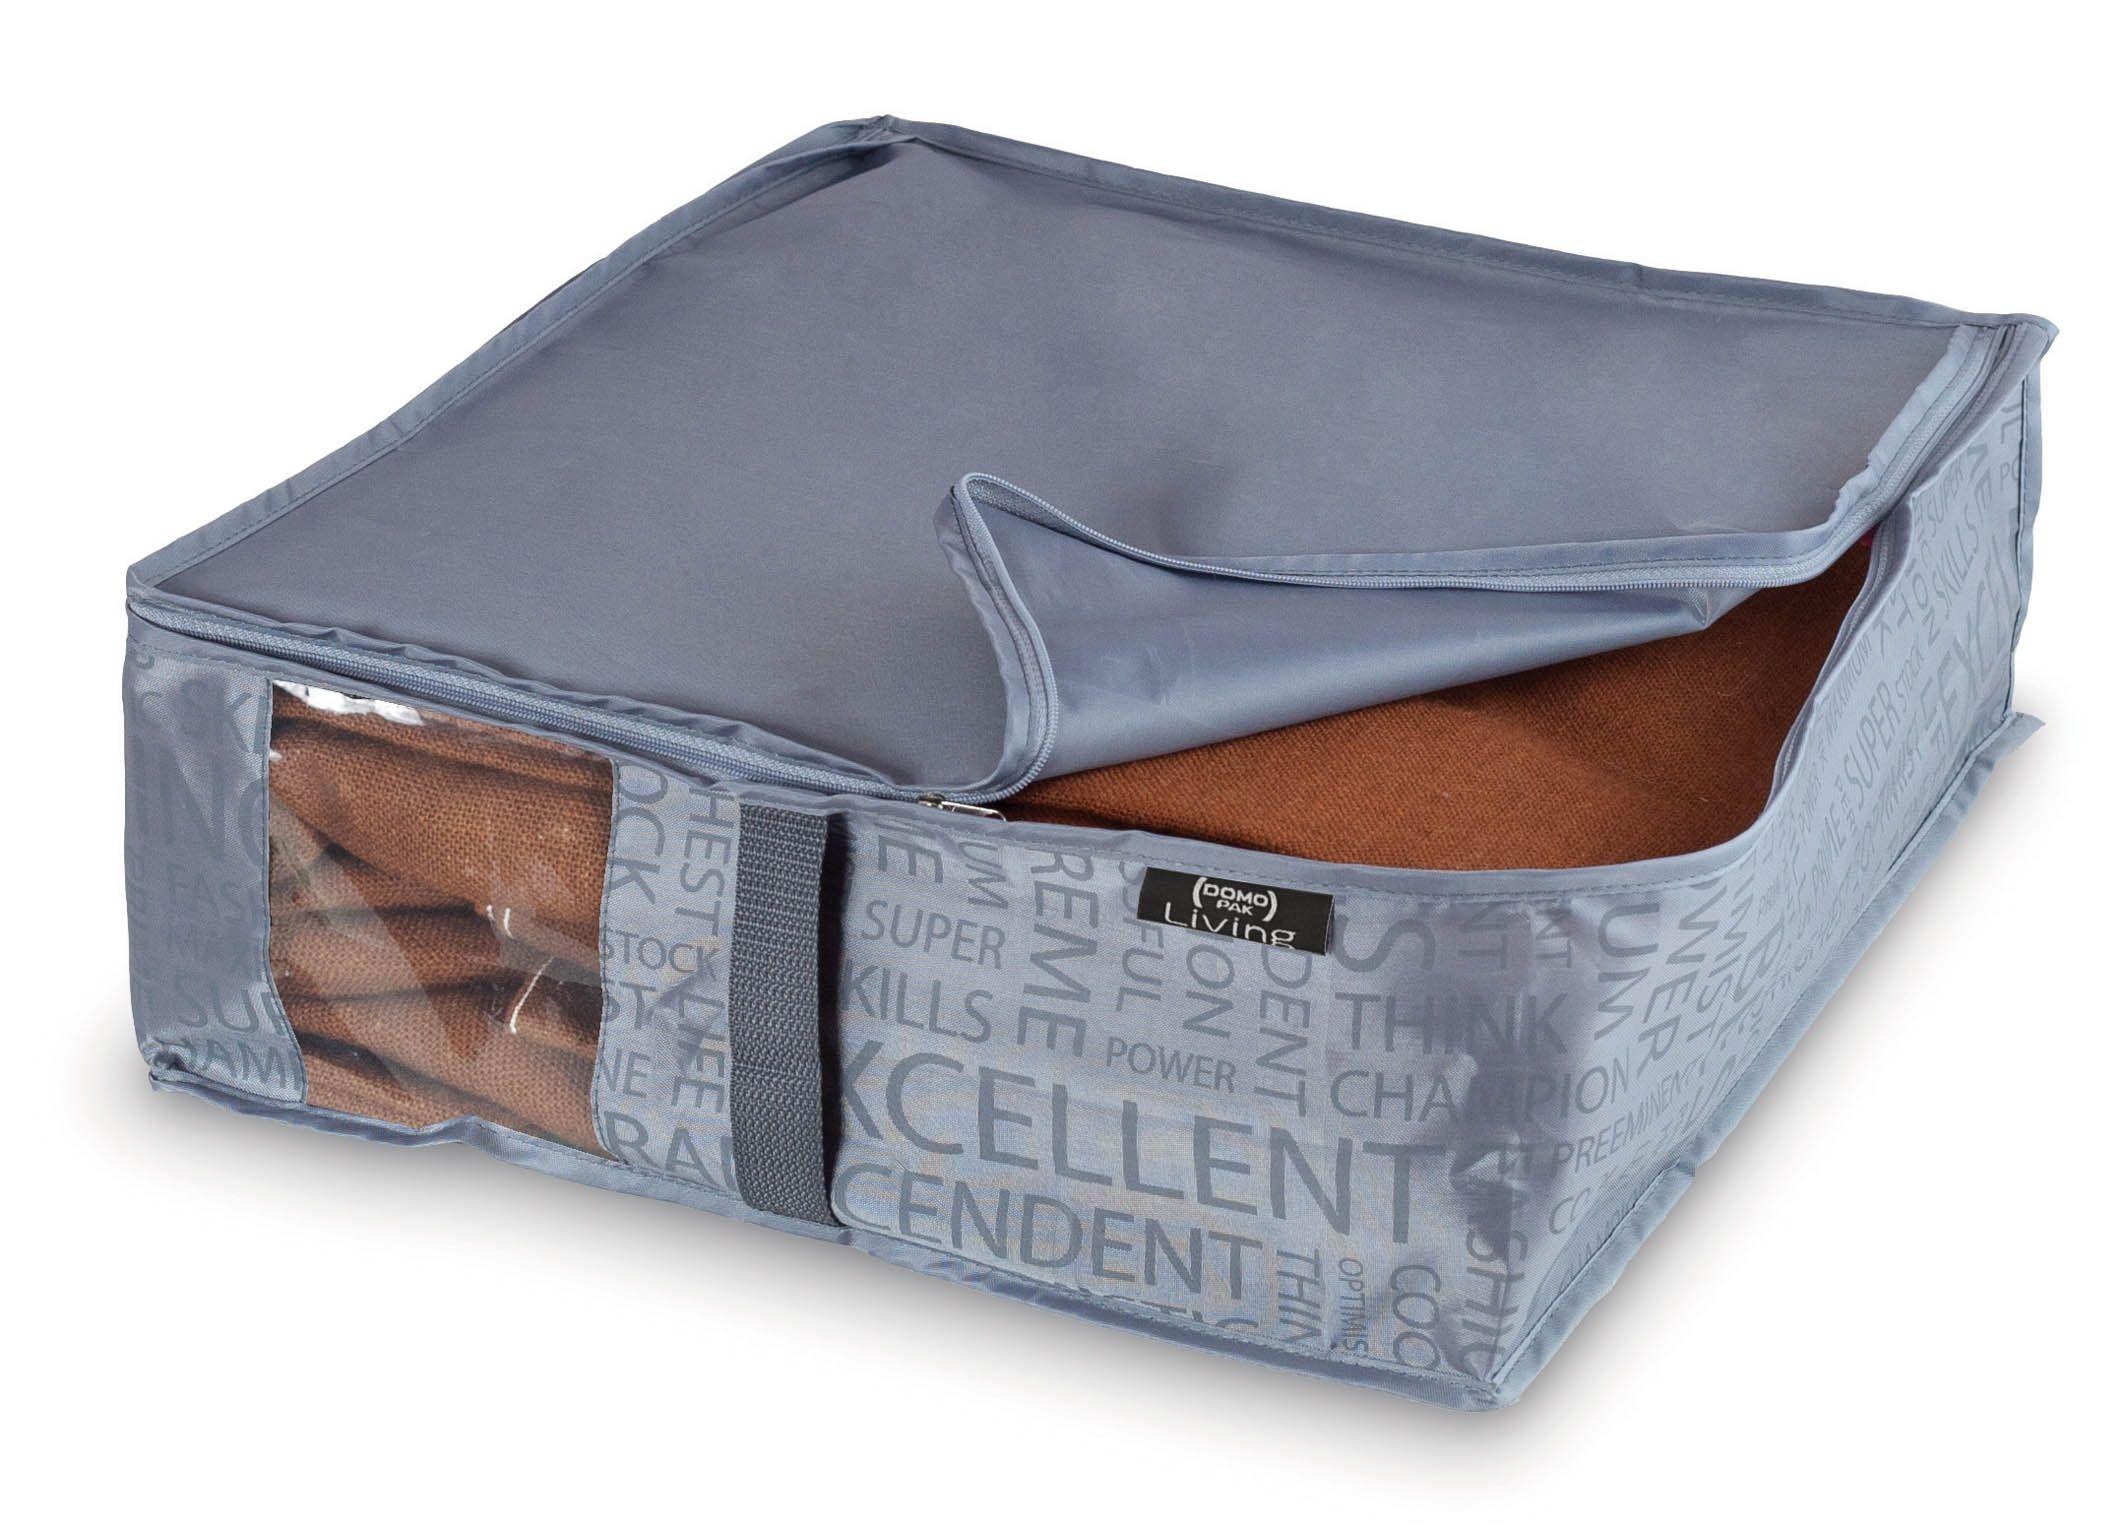 Organizator textil pliabil cu fermoar, Urban Gri, L45xl40xH15 cm imagine